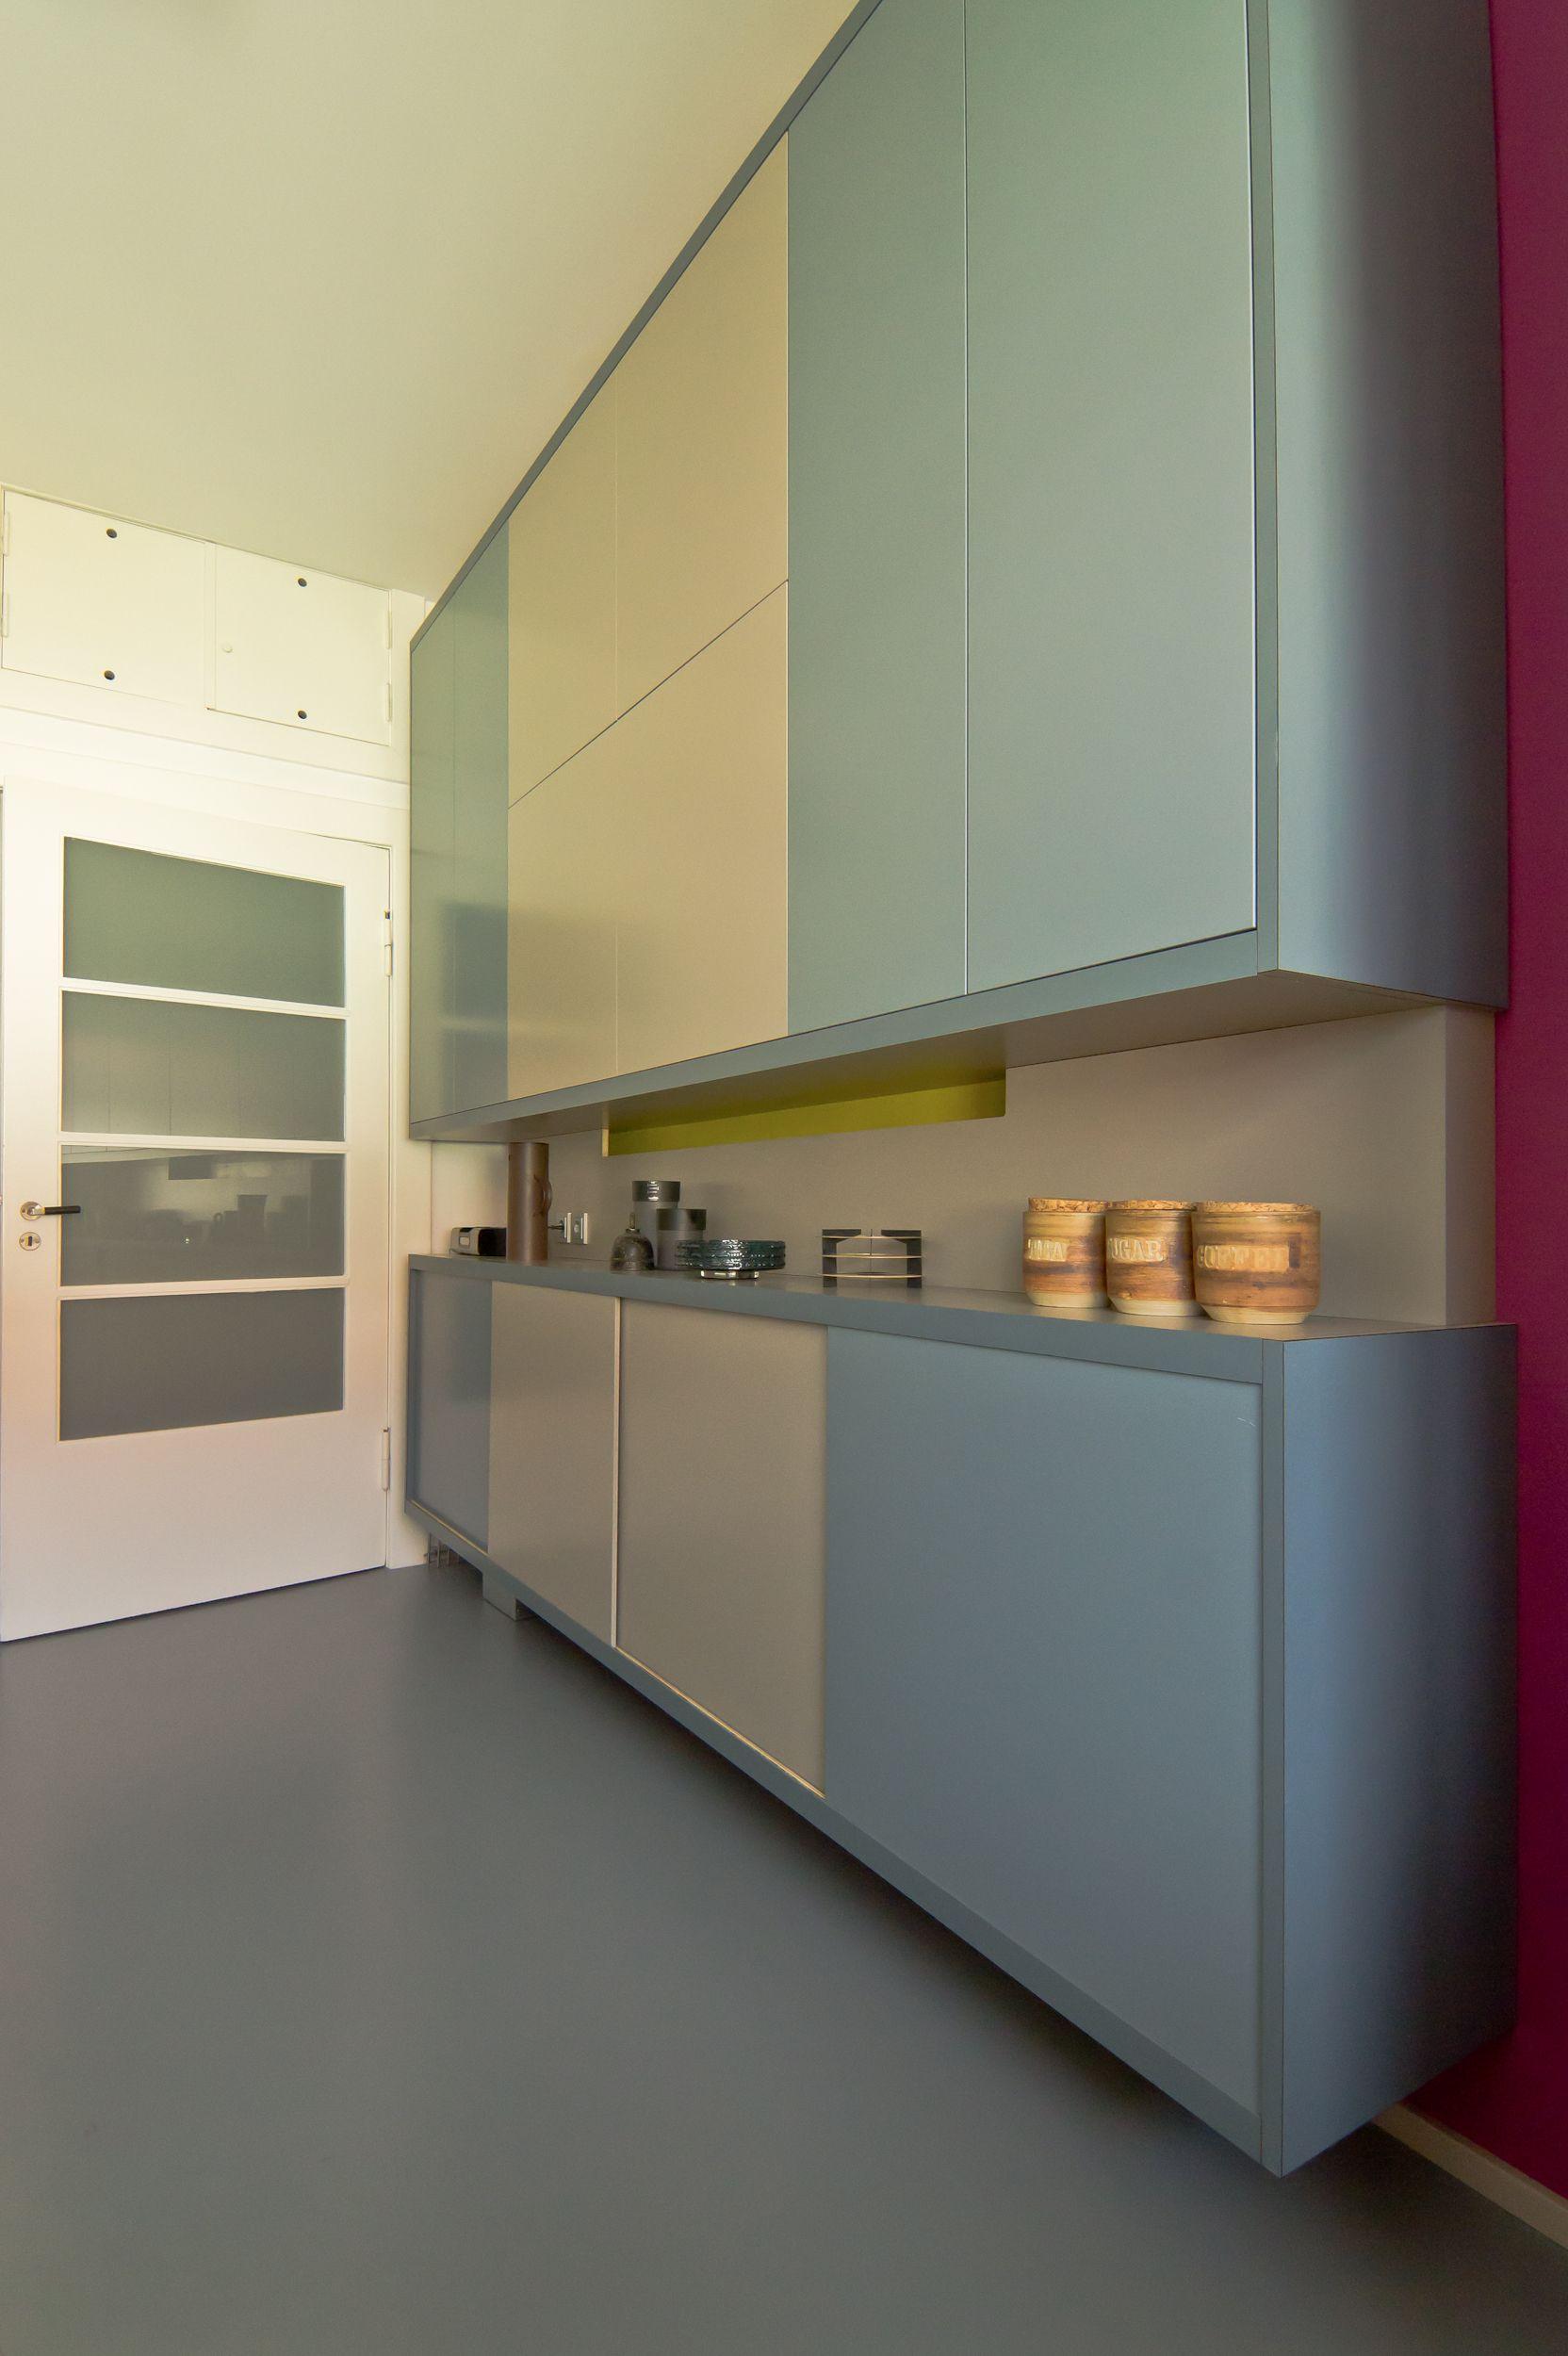 Linoleumboden grau  Bauhauswohnung Berlin- Tiergarten Küche, Hängeschränke, Dreh- und ...